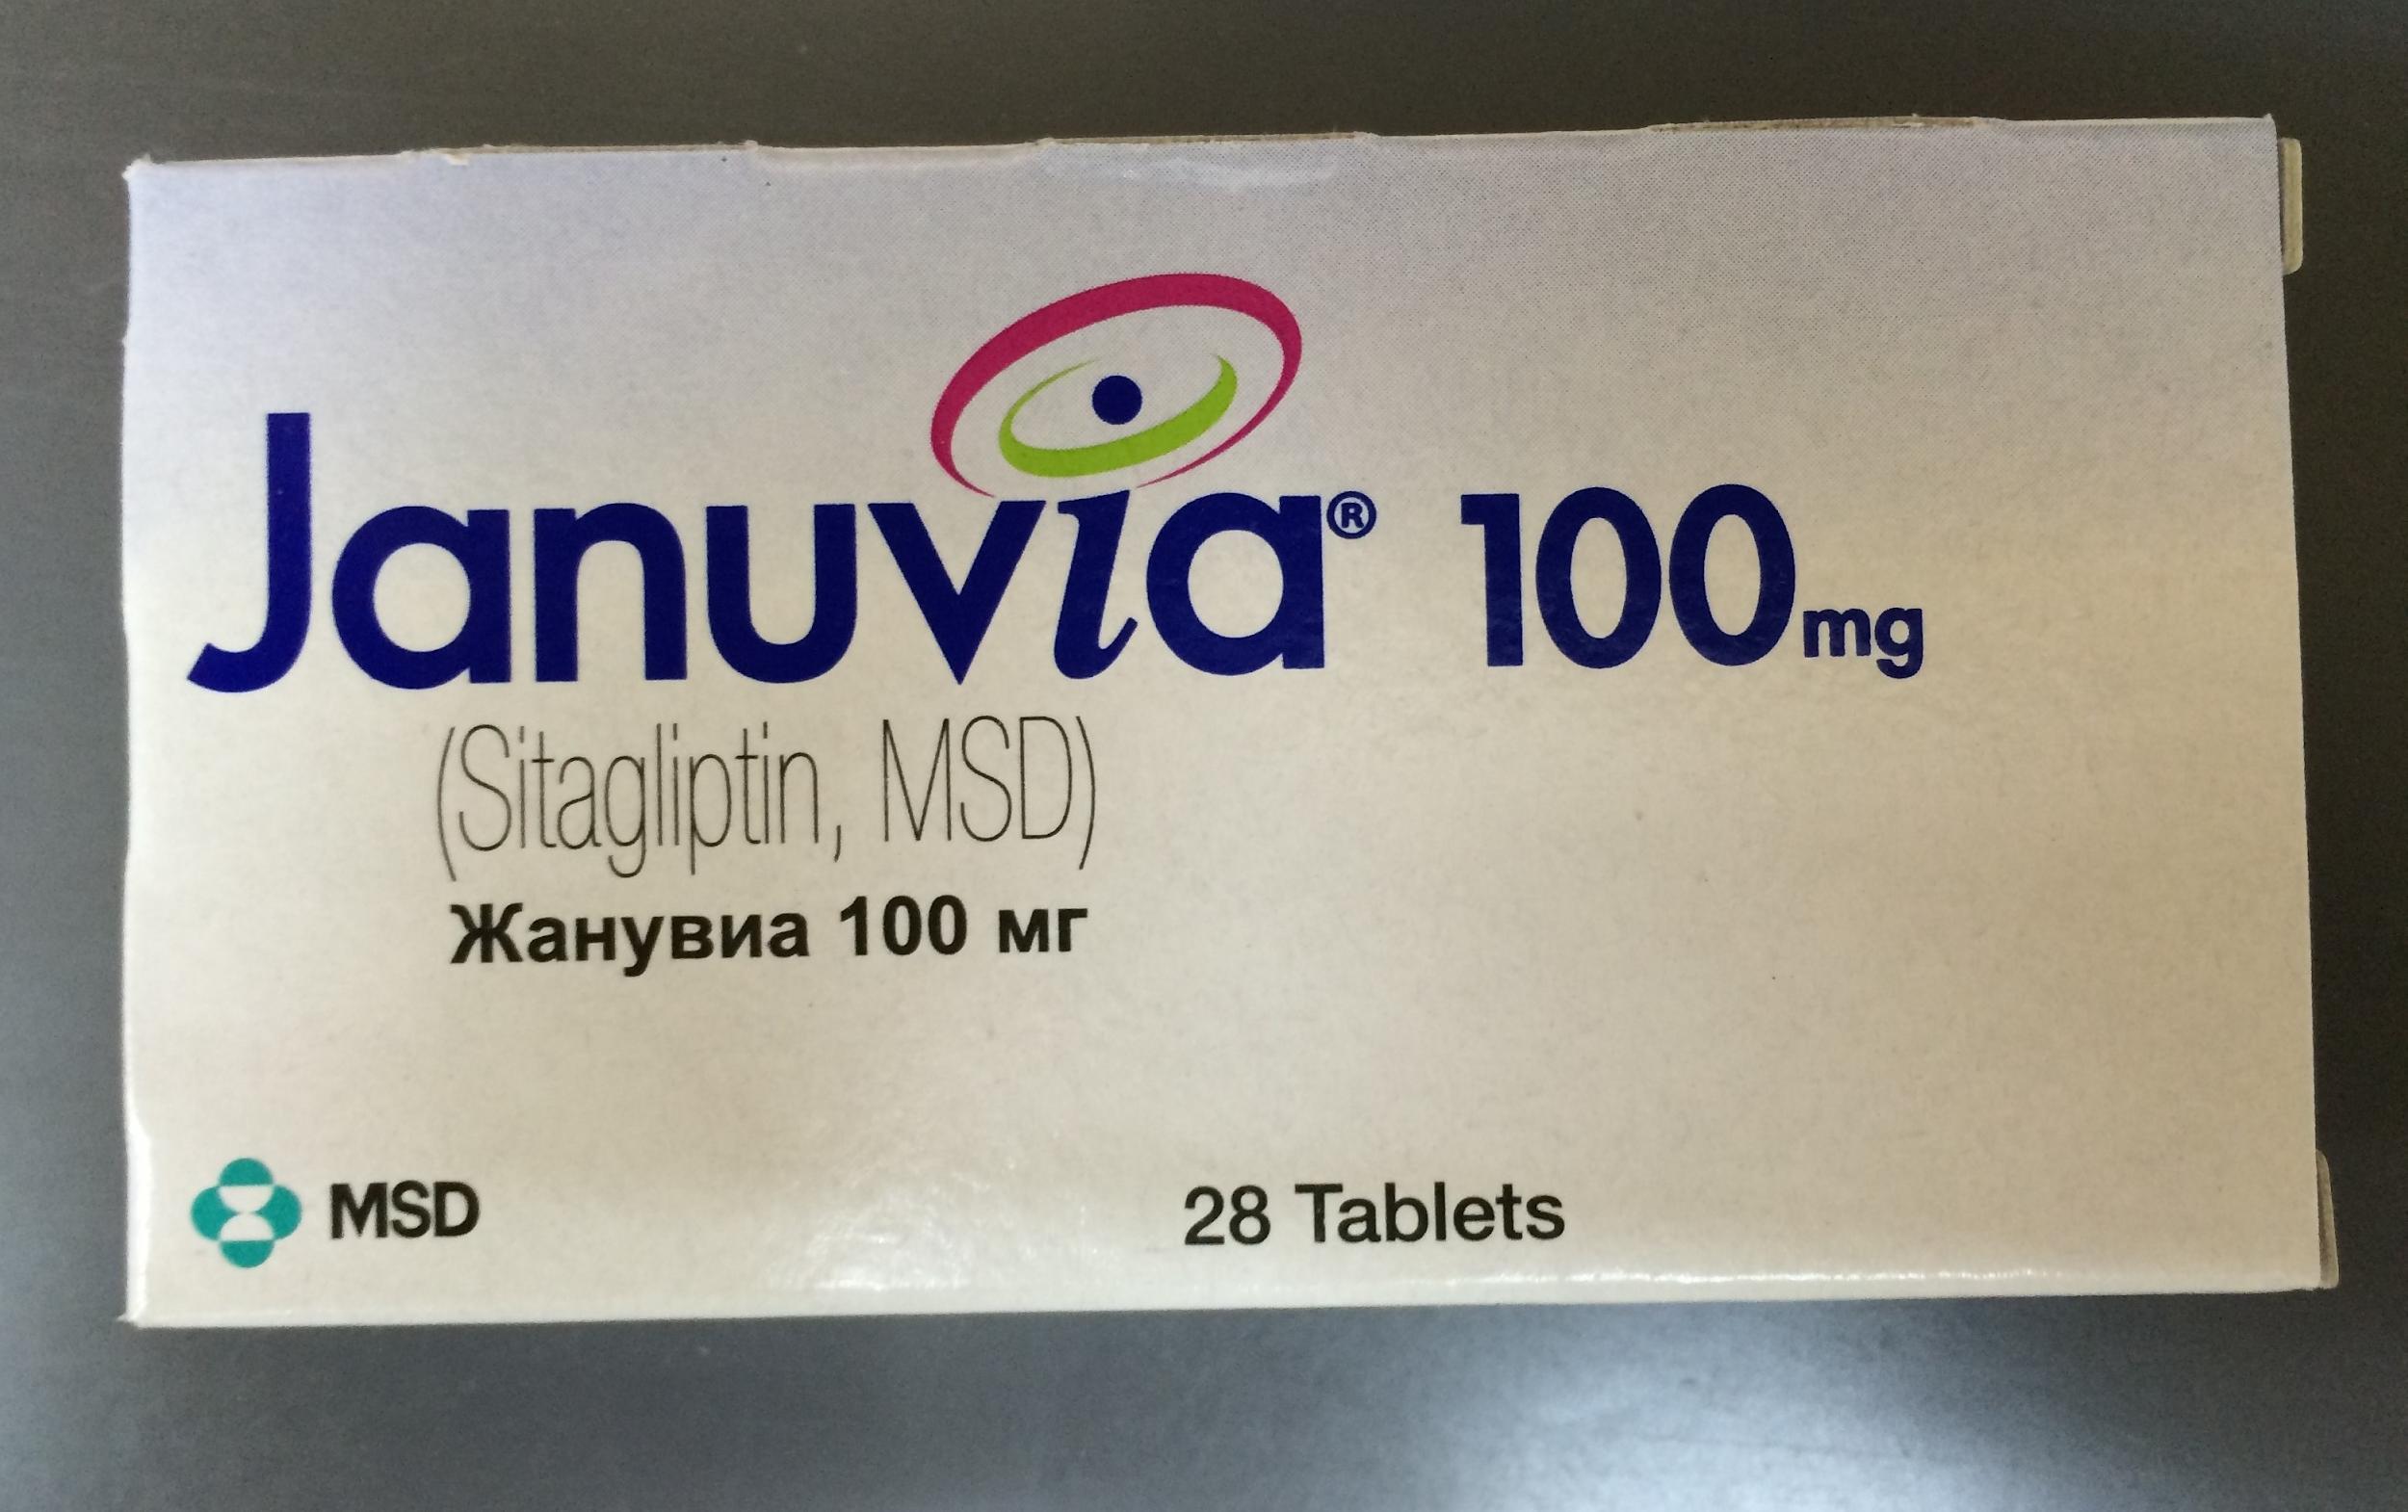 Photo showing closeup of Januvia package.